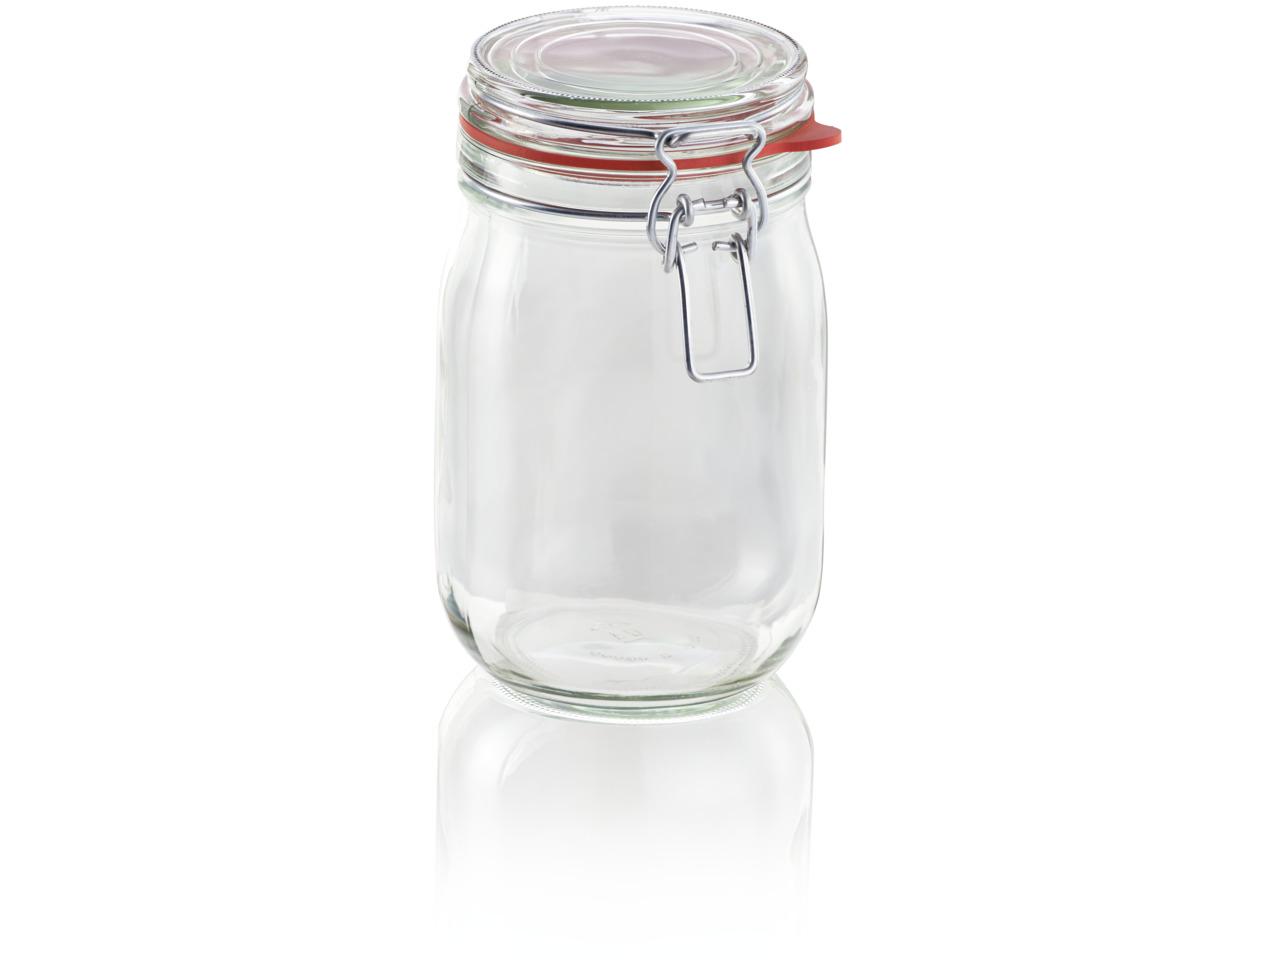 LEIFHEIT 3193 Clip top jar 1140 ml